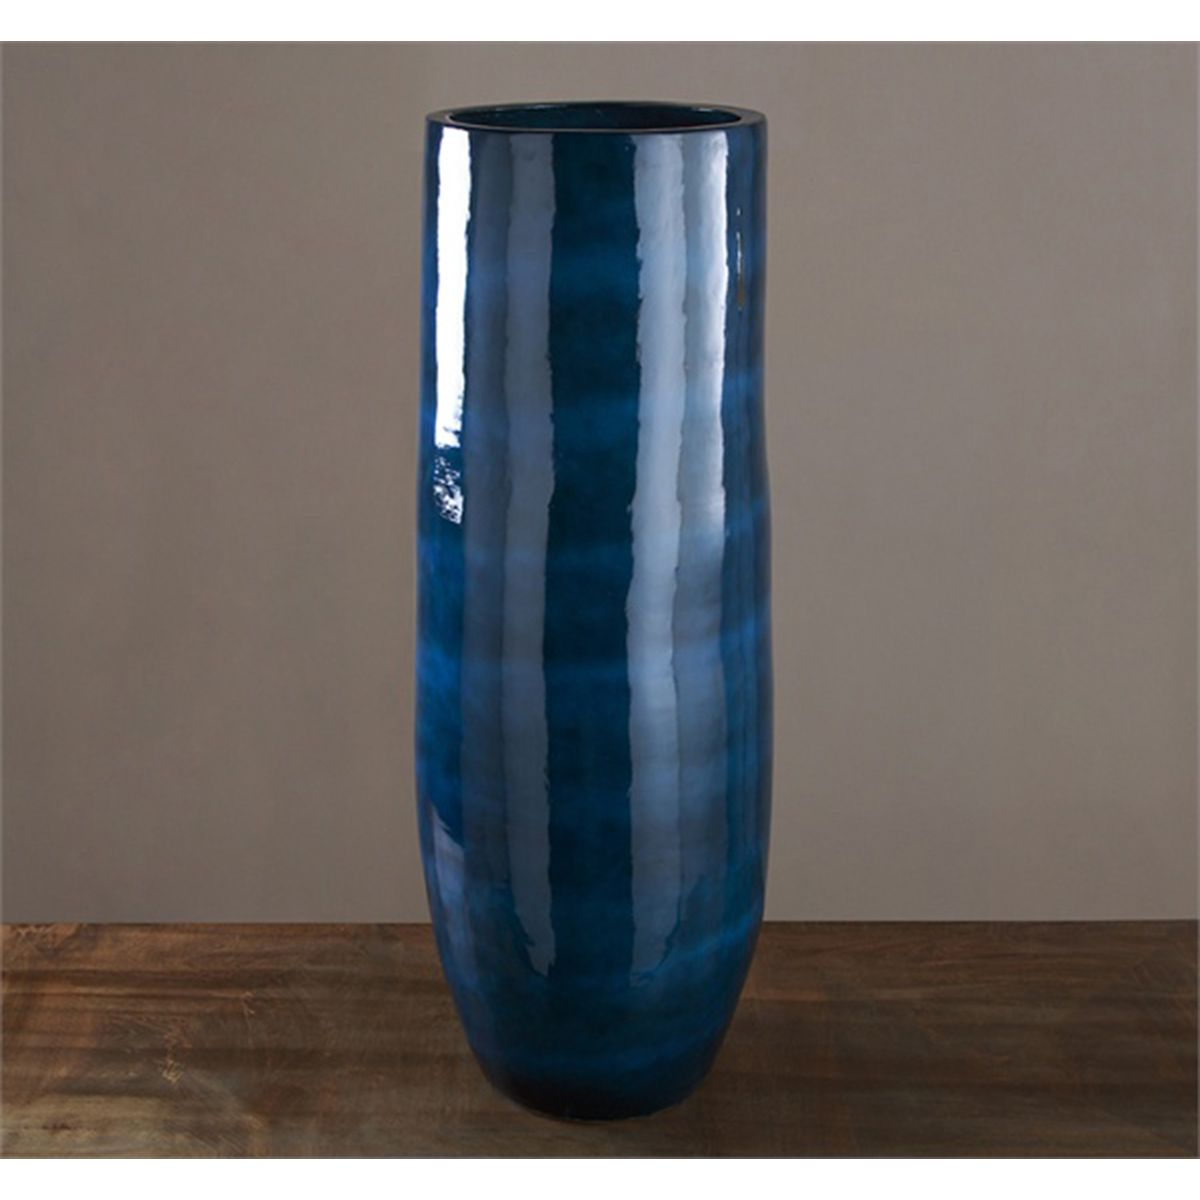 Intercule Home Azur Grand Vase 259002